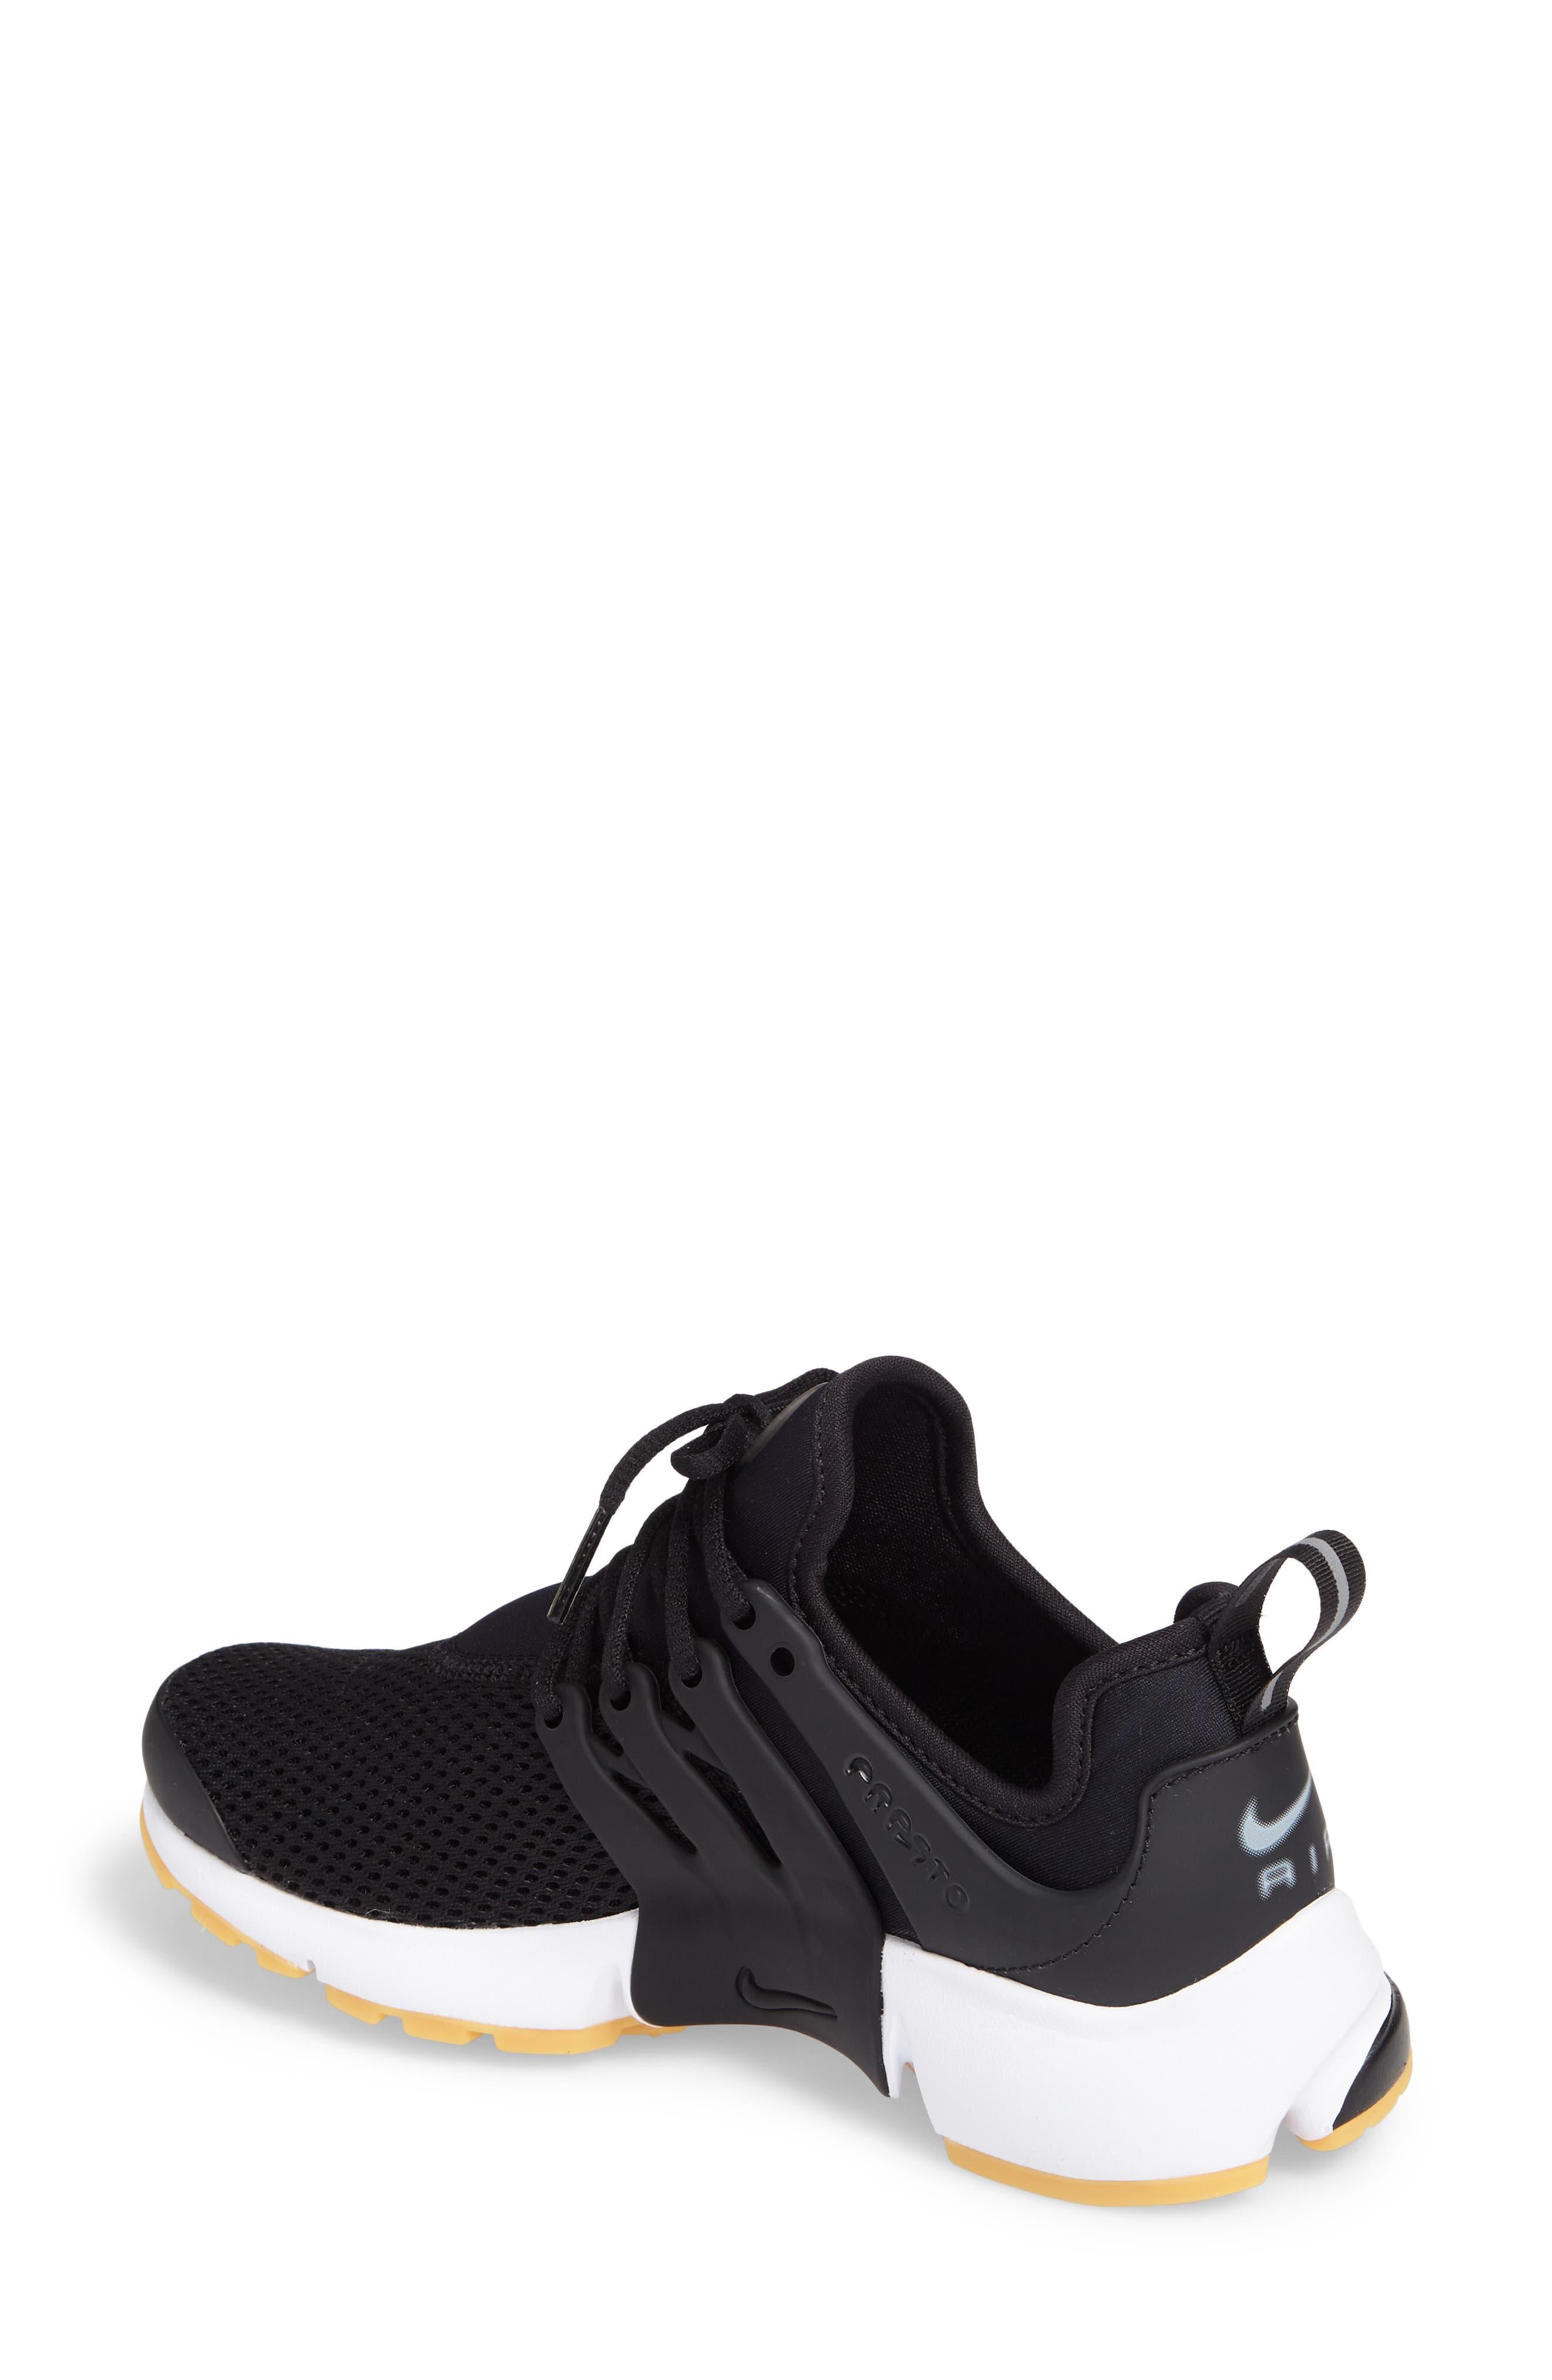 Air Presto Flyknit Ultra Sneaker,                             Alternate thumbnail 2, color,                             005